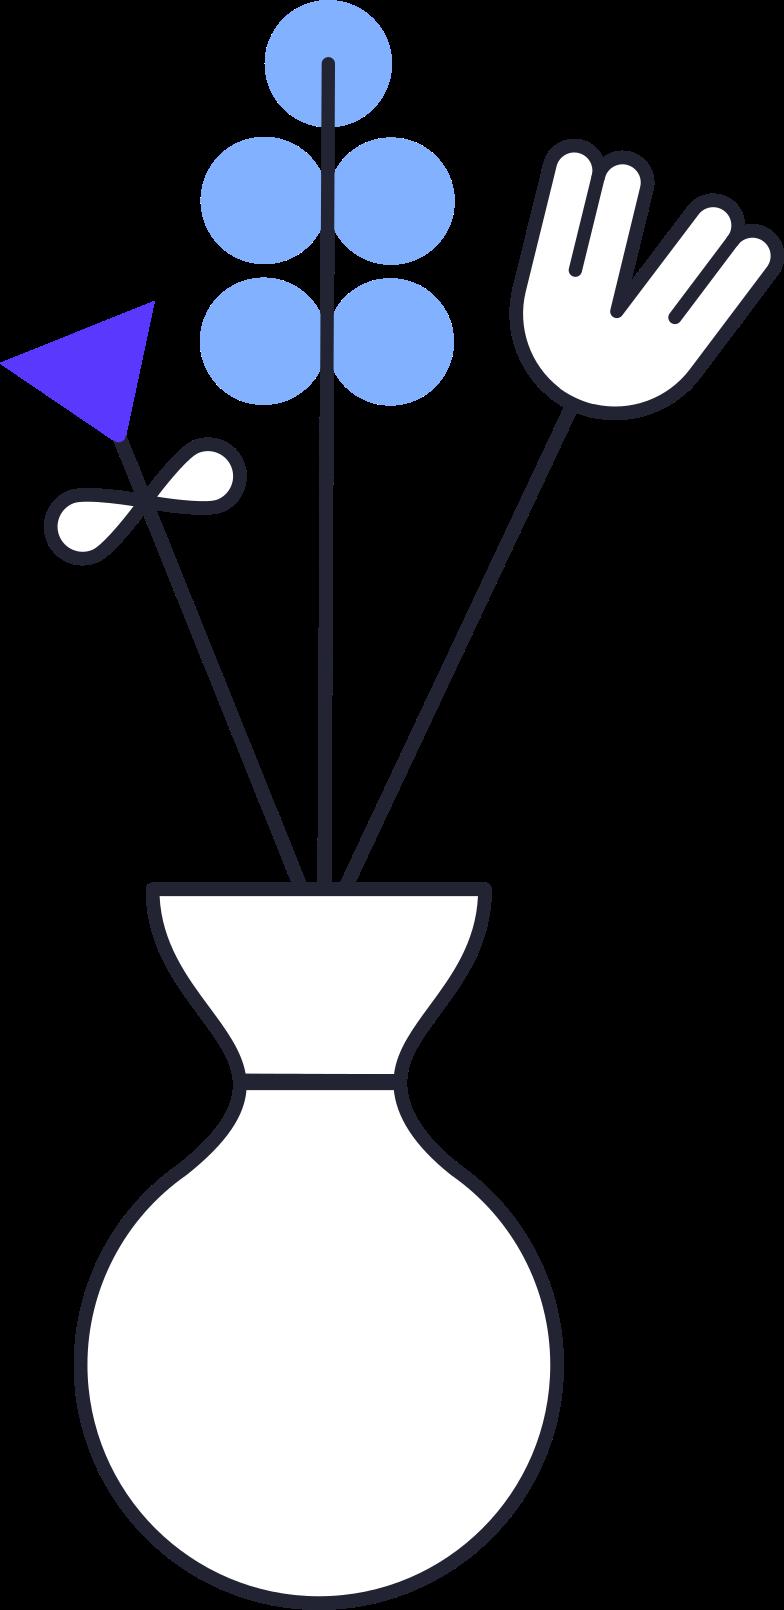 Familienblumen in vase Clipart-Grafik als PNG, SVG